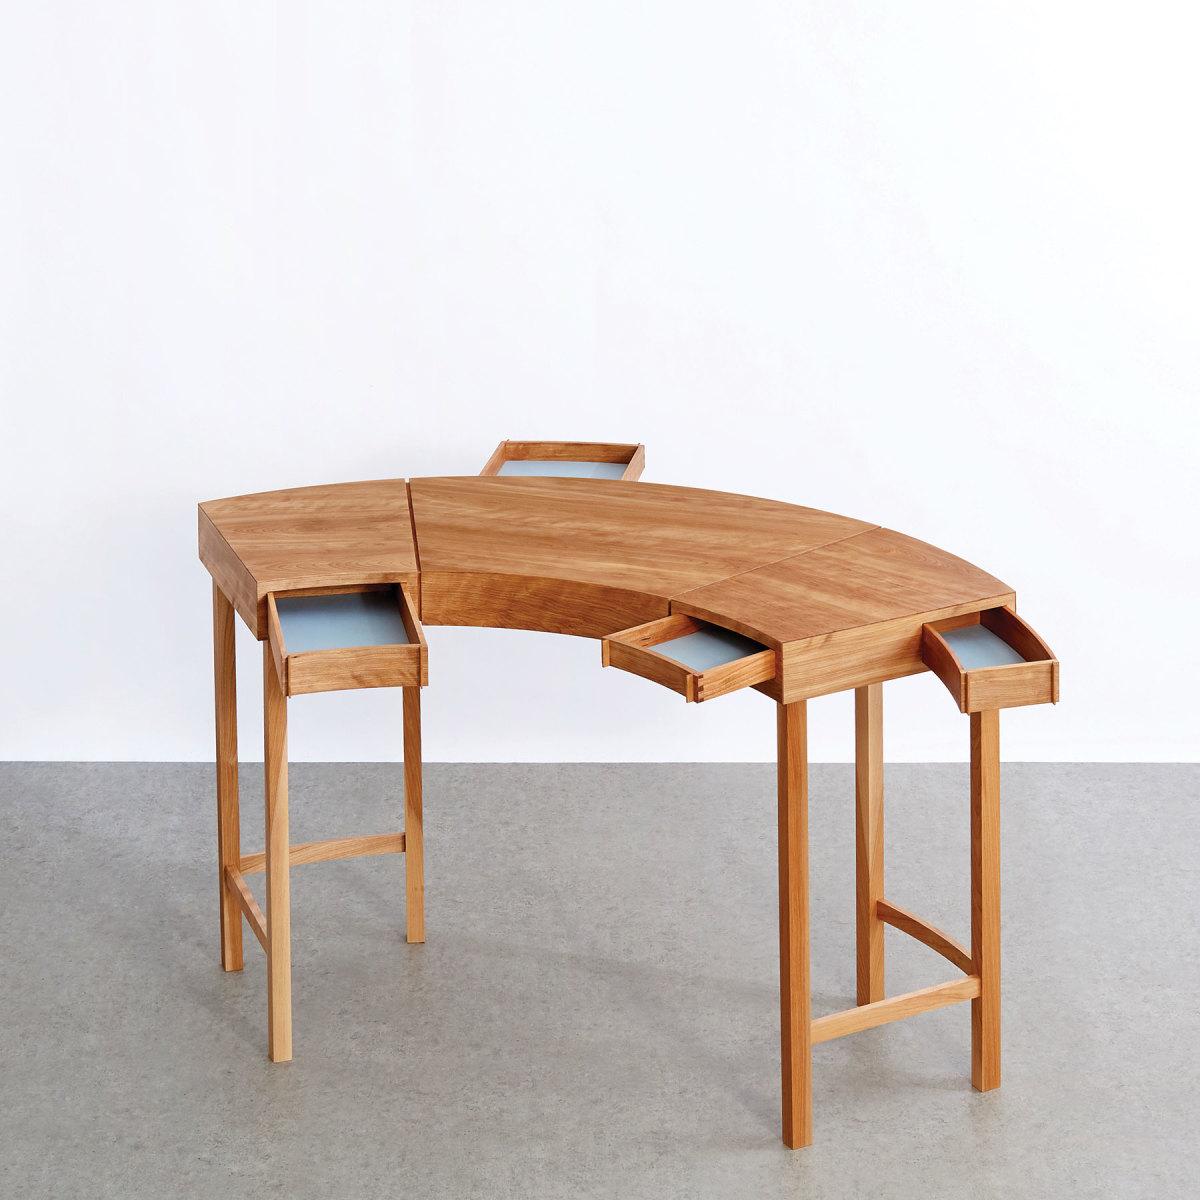 Desk by Sergey Levchin